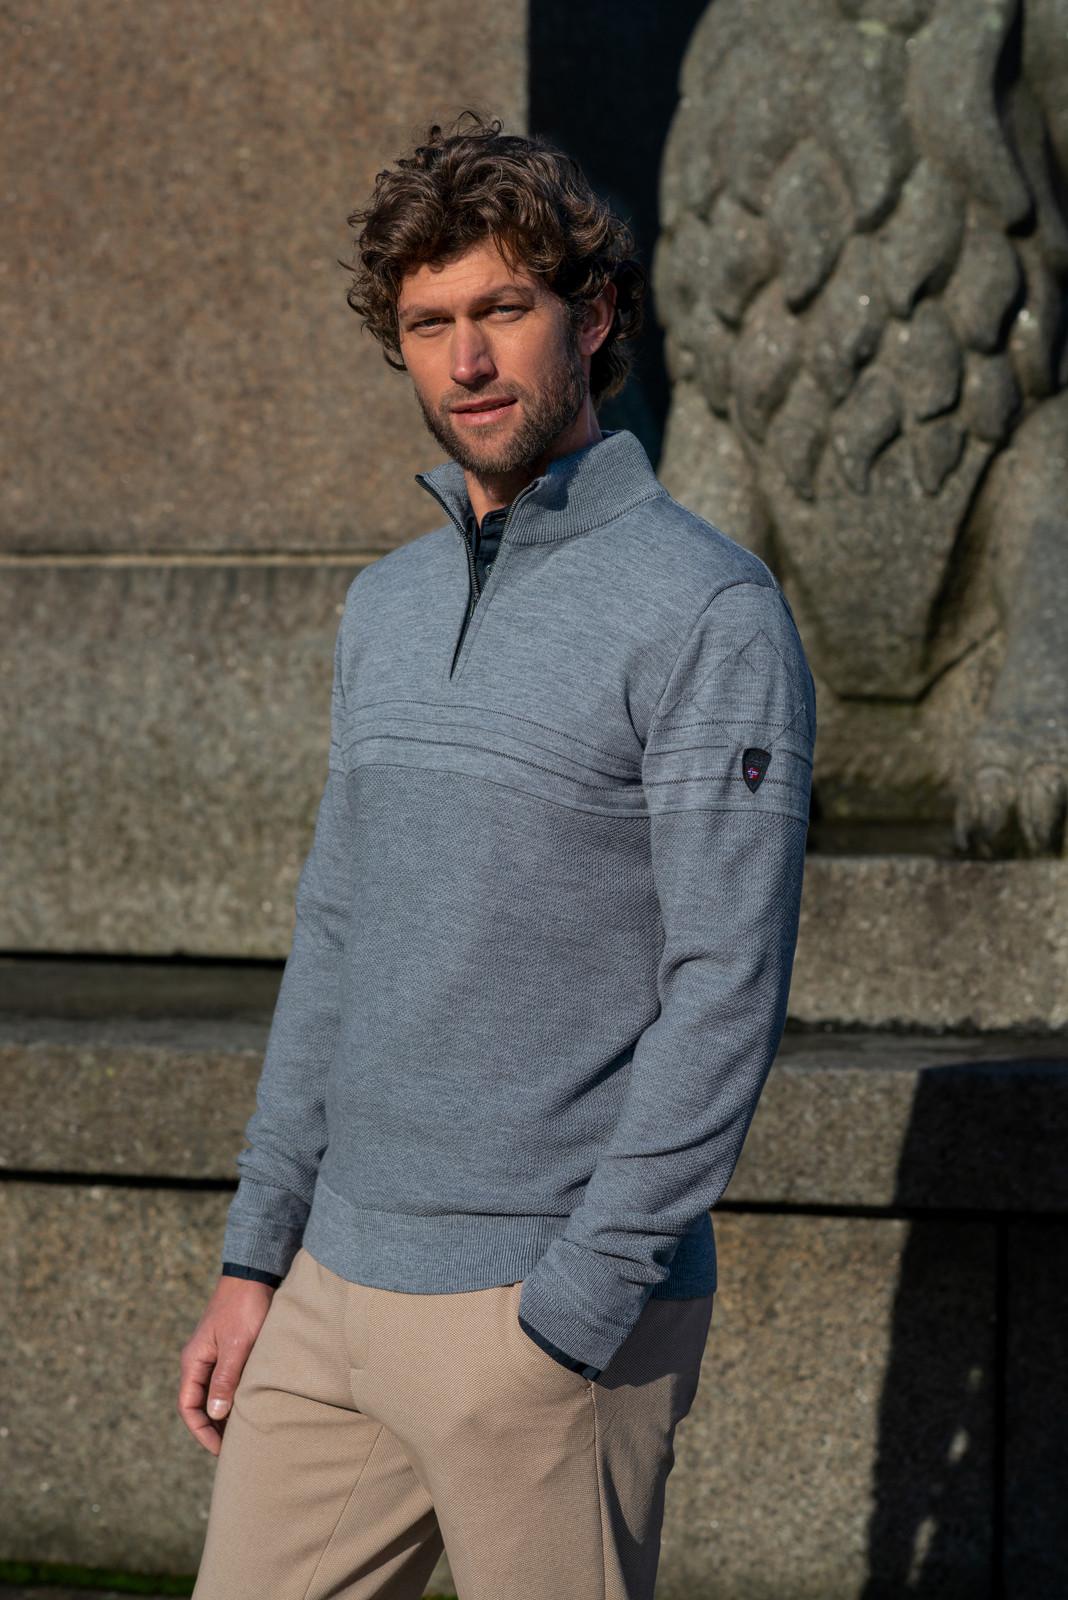 Dale of Norway Syv Fjell Half-Zip Sweater, Mens - Smoke/Dark Charcoal, 94191-E (94191-E)